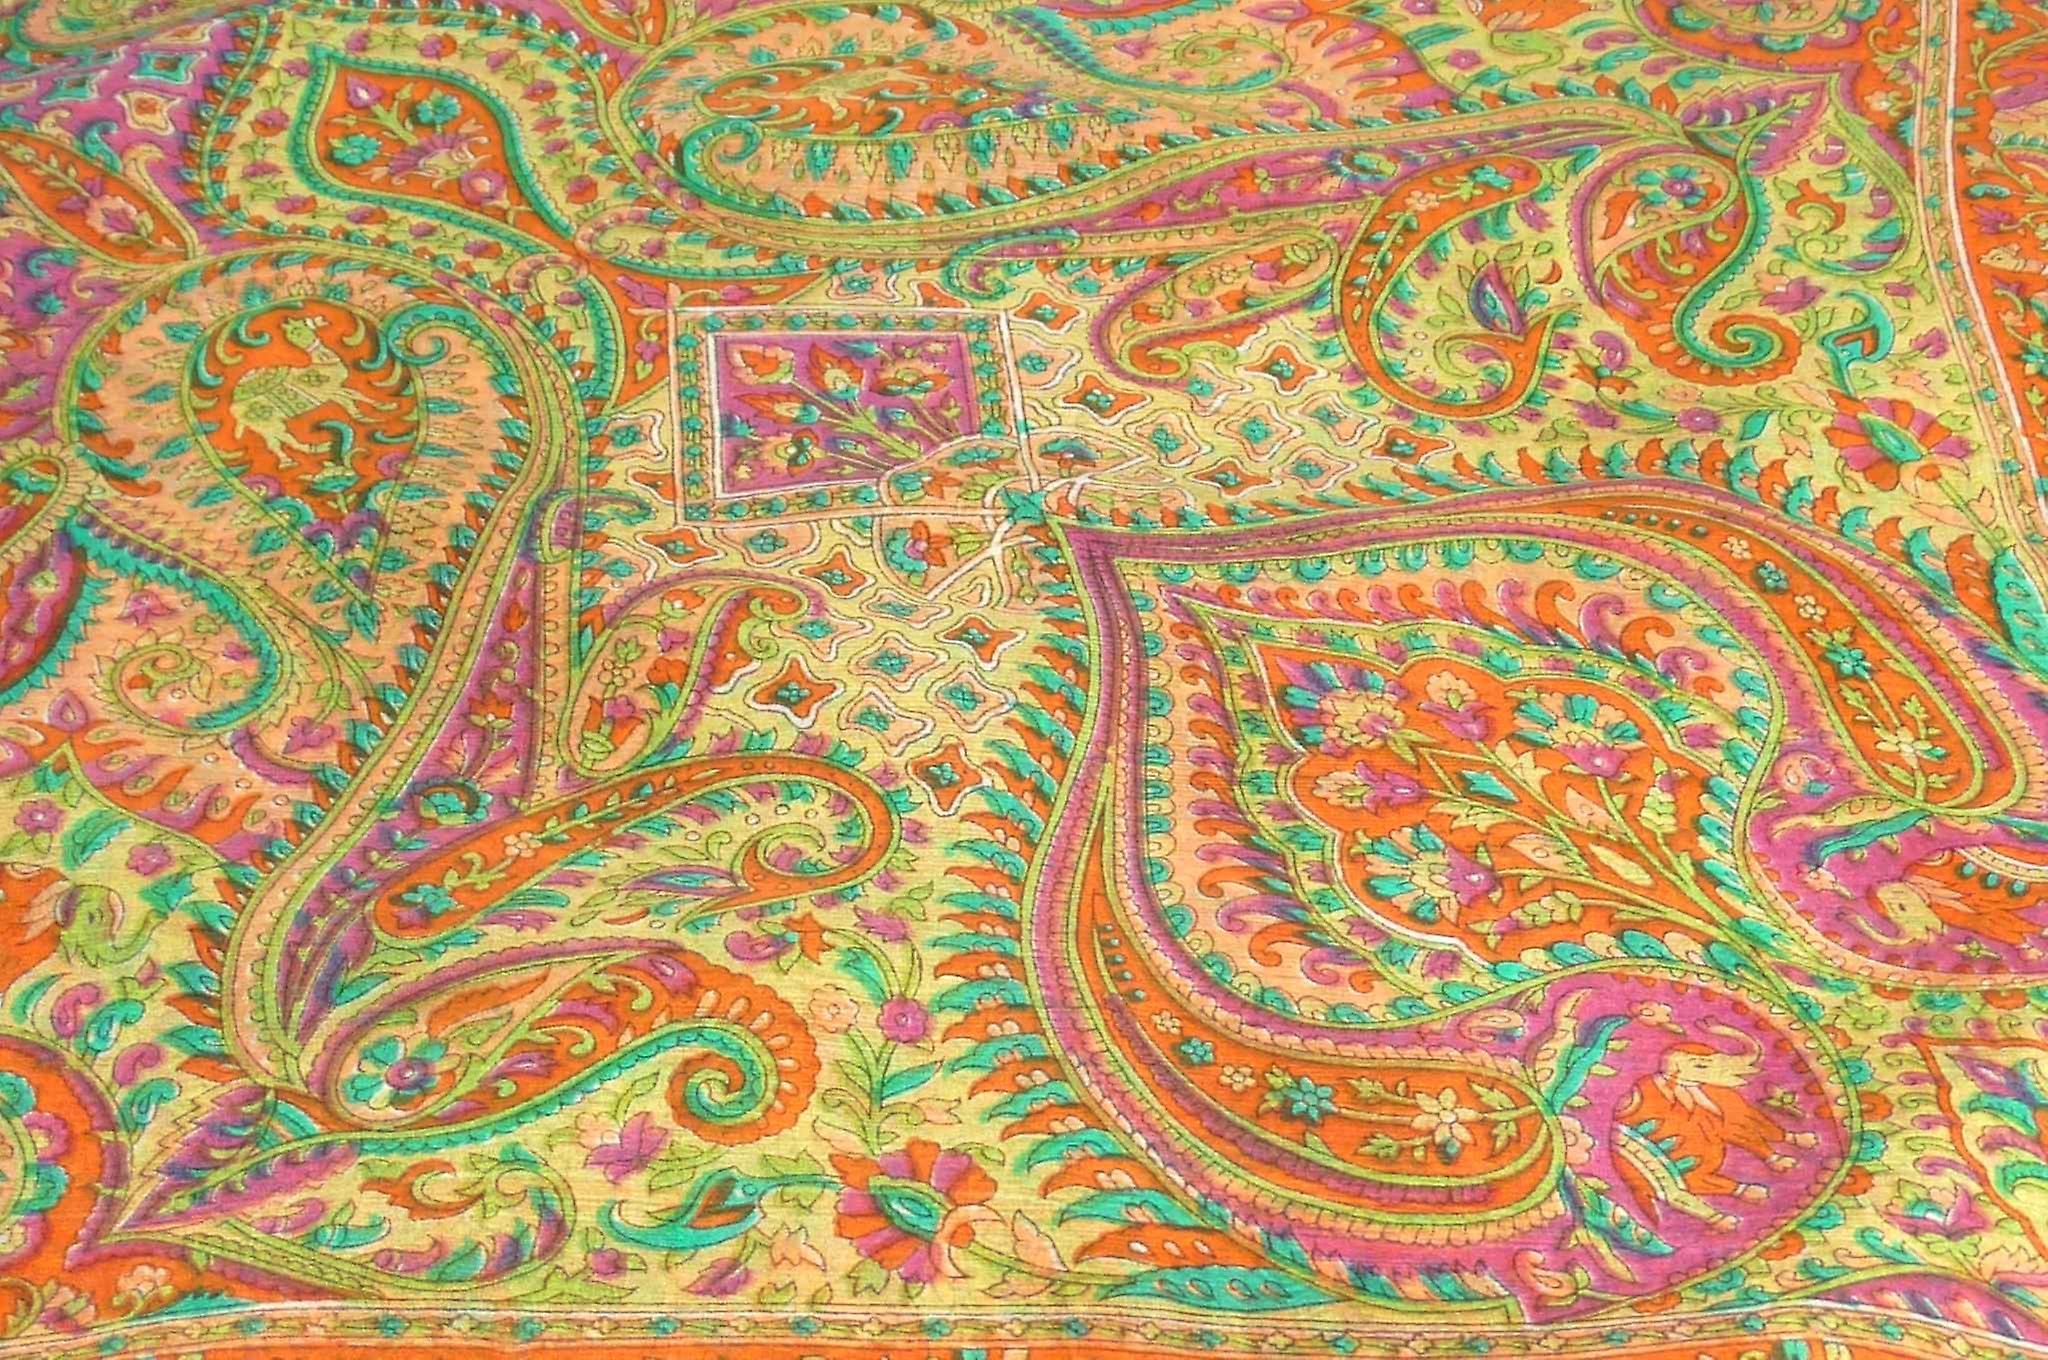 Mulberry Silk Traditional Square Scarf Zazim Terracotta by Pashmina & Silk